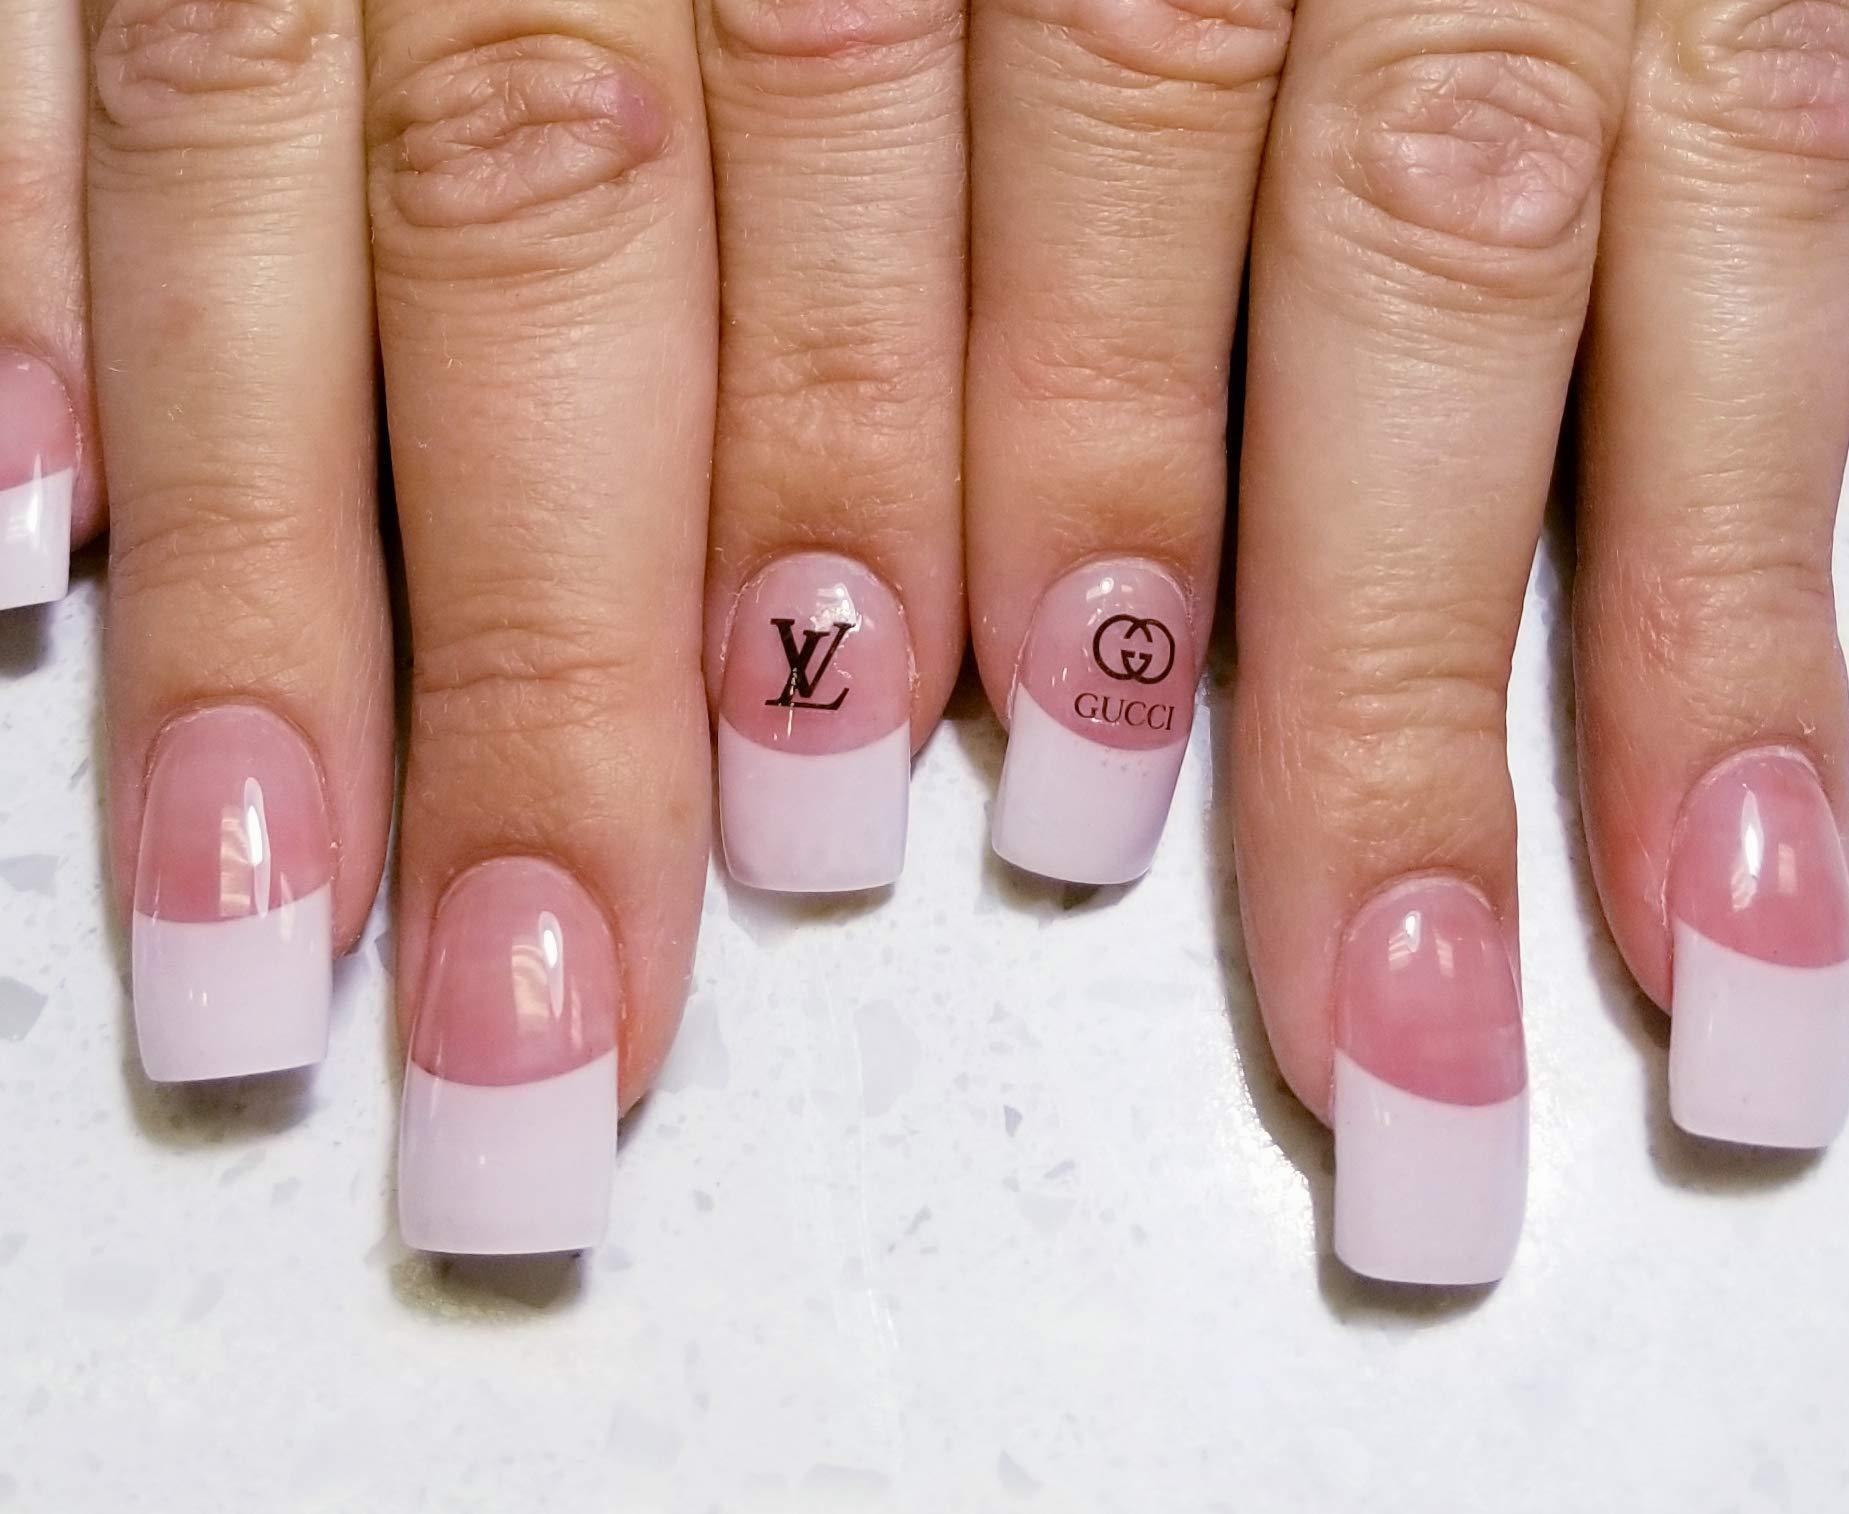 Elegant Nail Art-Decal Fun Luxury Nail Stickers-Designer - Toenail Sticker - Manicure-Acrylic Gel Nail (YL) by Shop2Beat